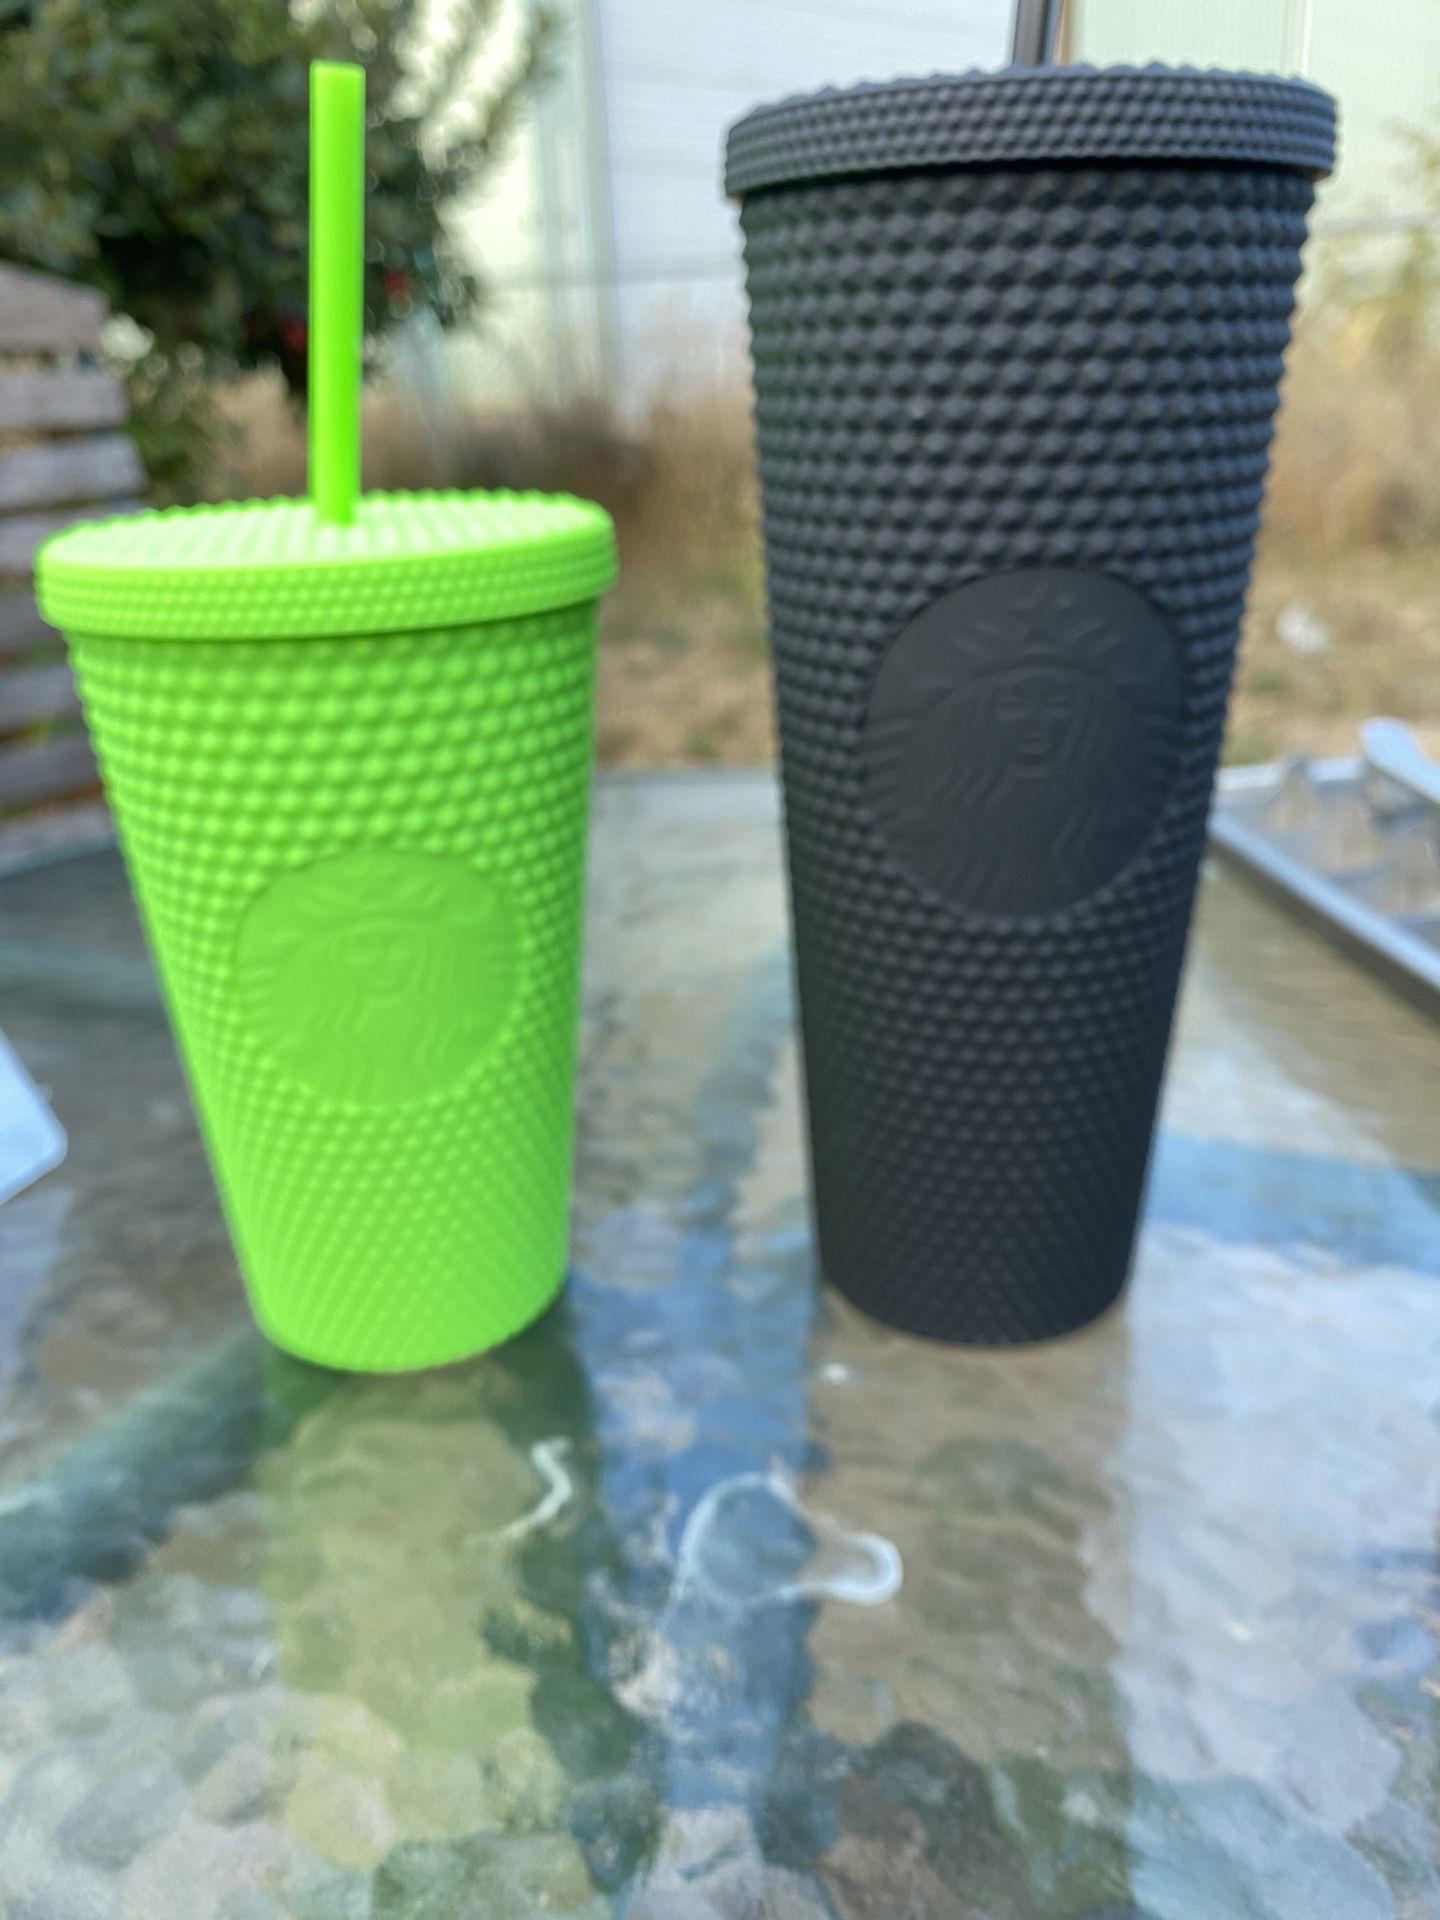 Starbucks Fall 2021 Black Tumbler (24oz) And Lime Green (16oz)